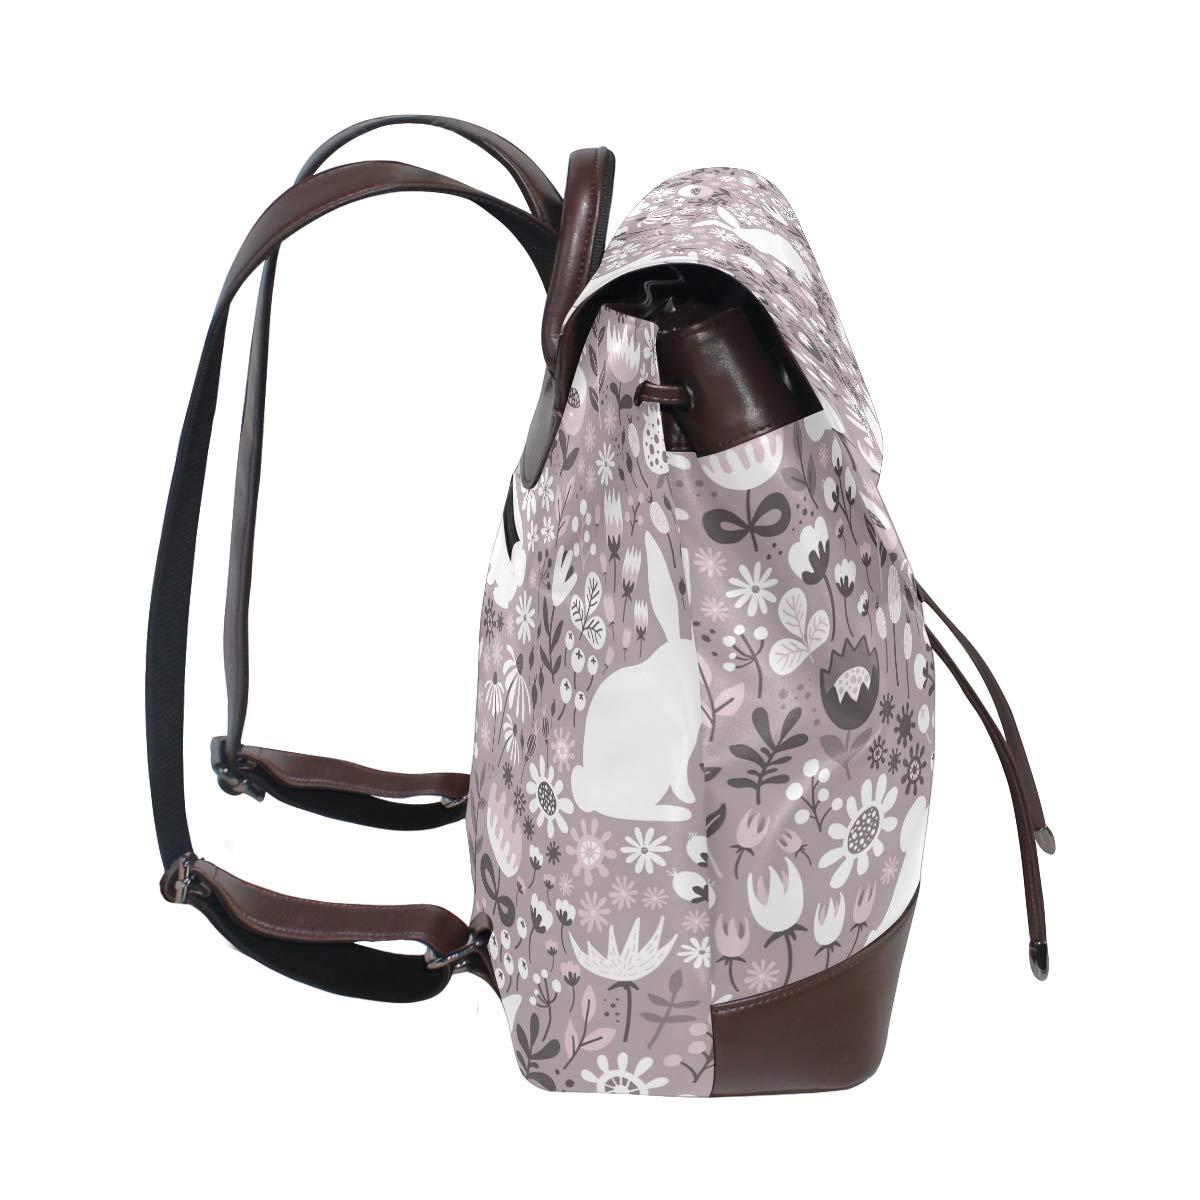 Wolf Backpack PU Leather School Shoulder Bag Rucksack for Women Girls Ladies Backpack Travel Bag